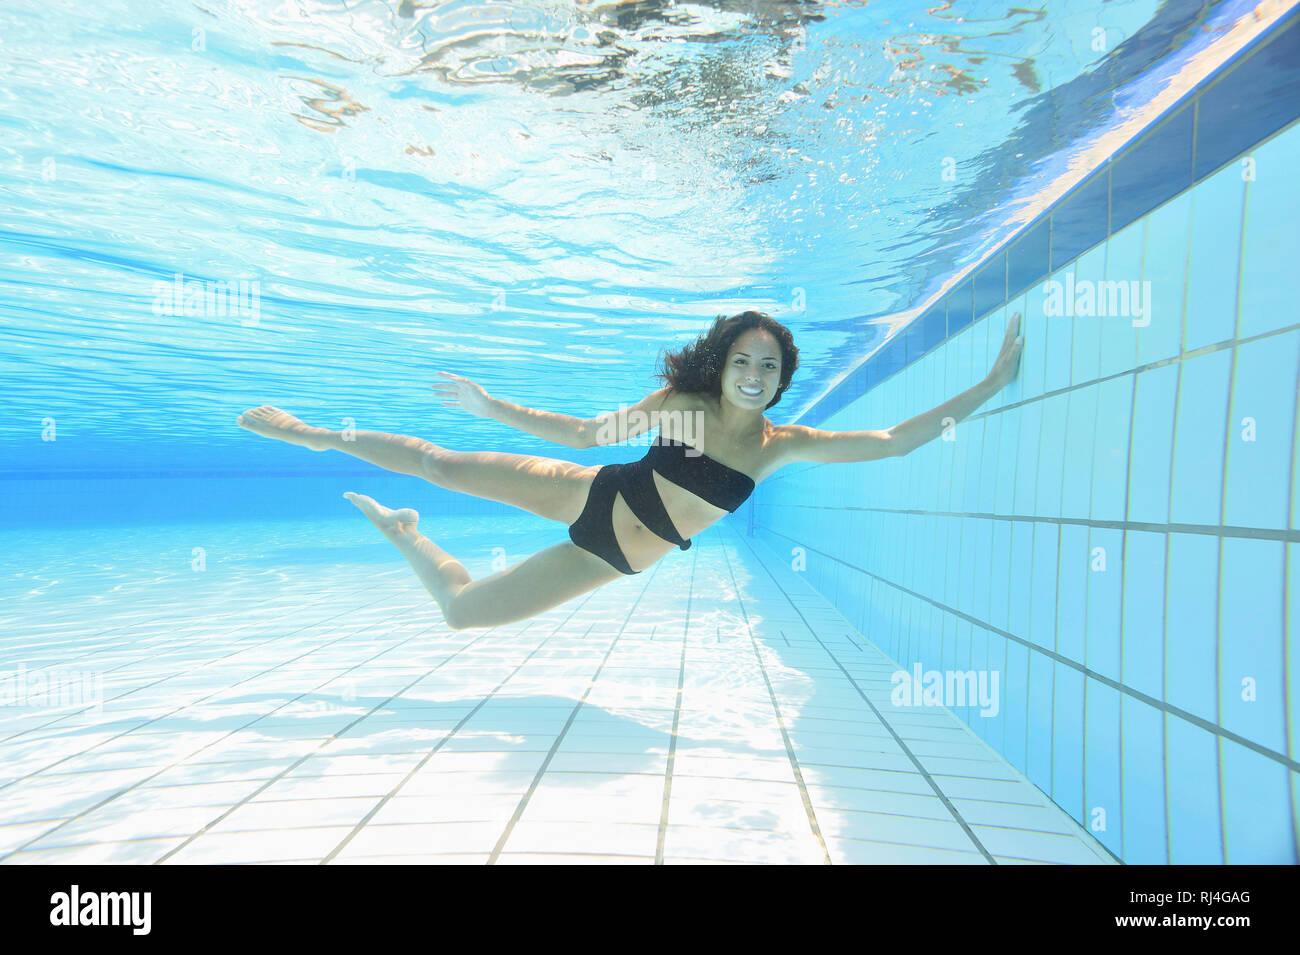 Frau, jung, Monokini, Freibad, Unterwasser, schwimmen, Blick Kamera - Stock Image